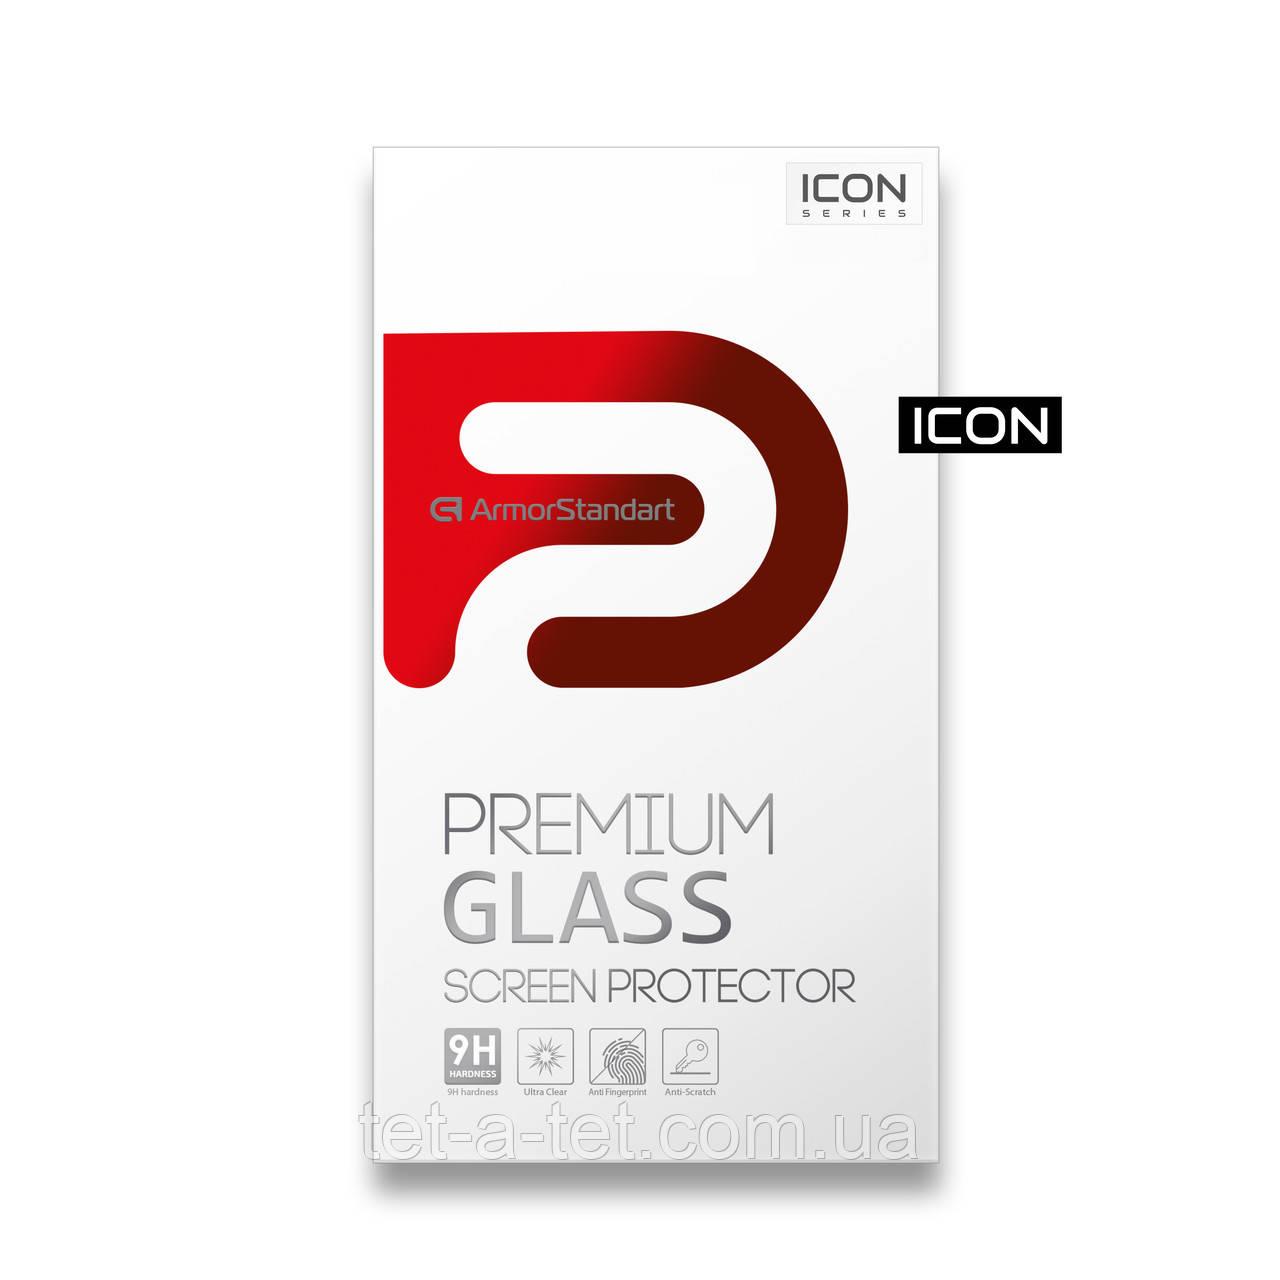 Защитное стекло Armorstandart Icon для Xiaomi Redmi Note 9T Black (premium glass)